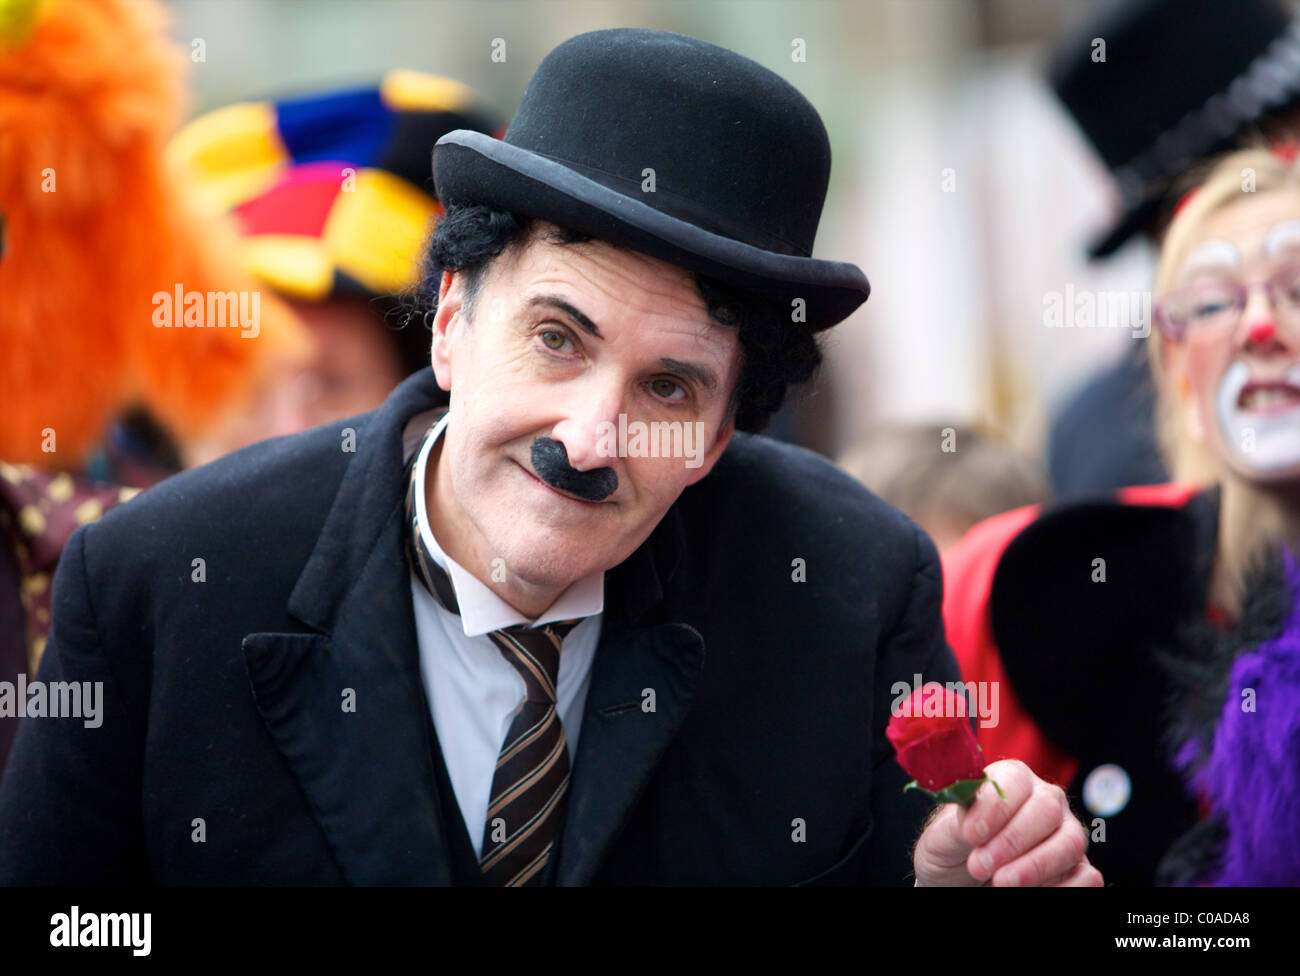 Clown dressed as Charlie Chaplin - Stock Image